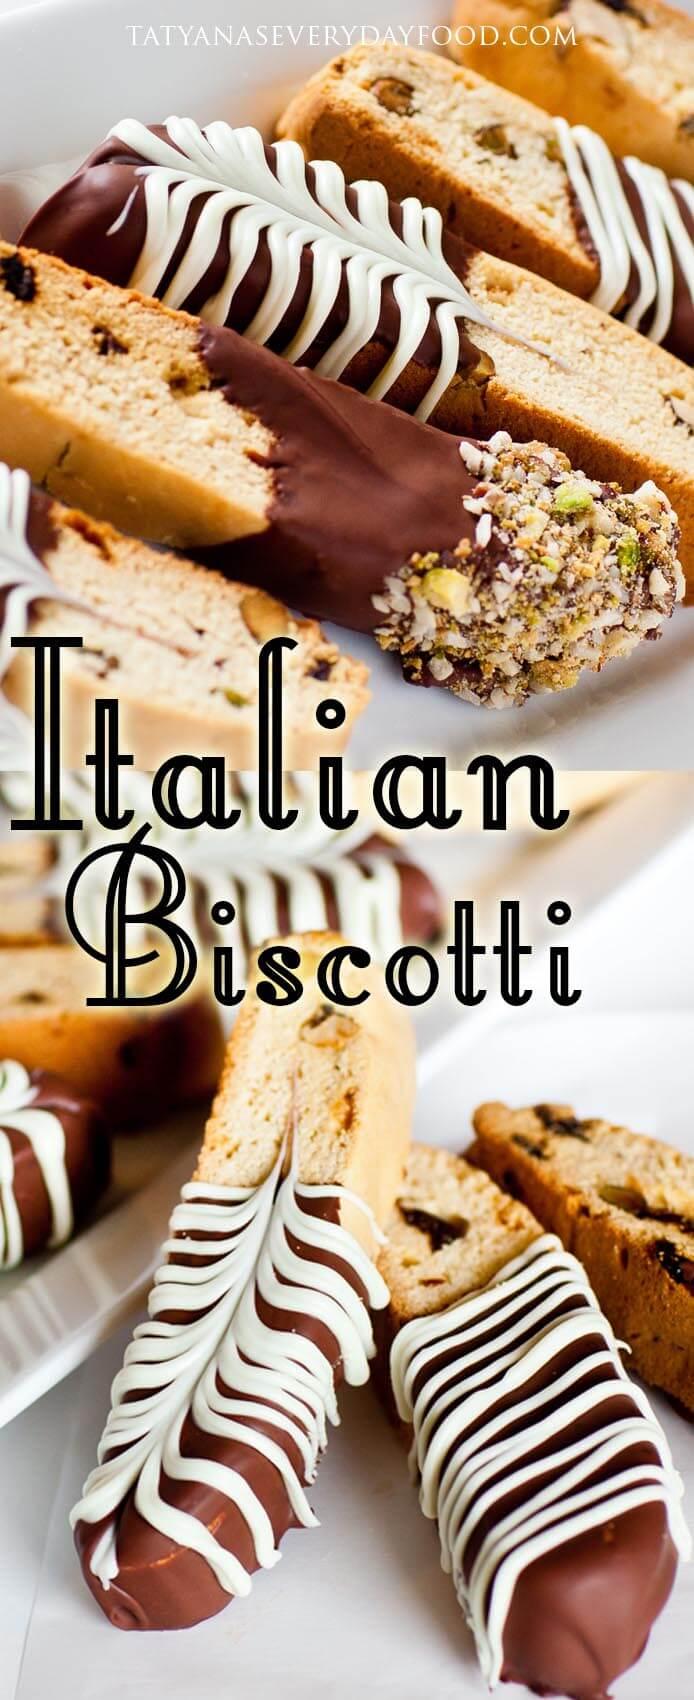 Classic Italian Biscotti video recipe